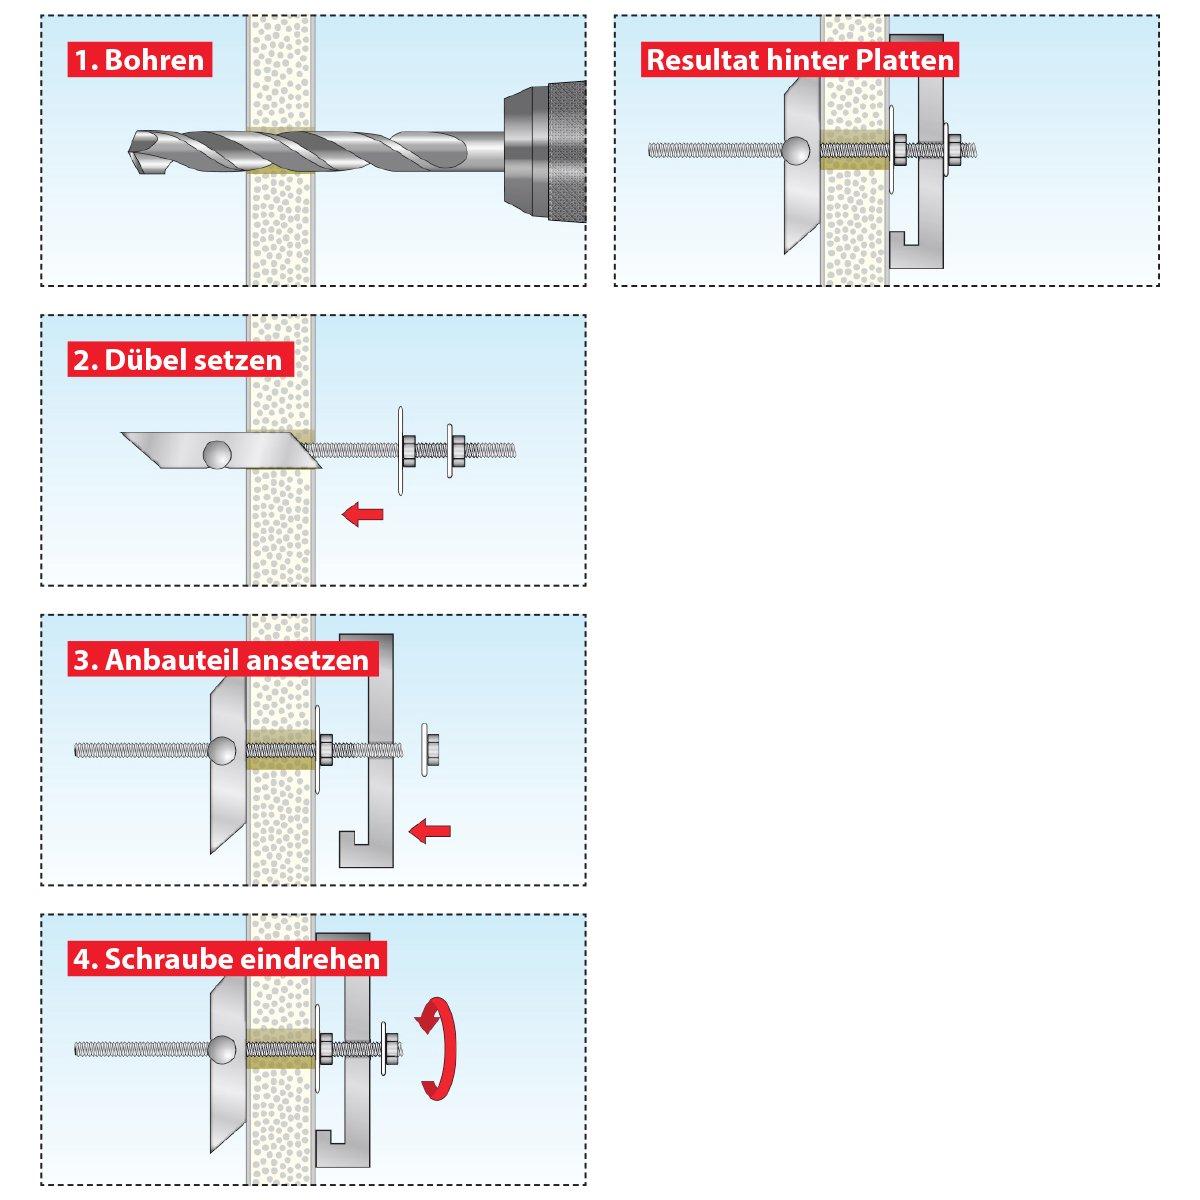 023100171 10 pieces TOX toggle plug Spagat Pro M8 mm